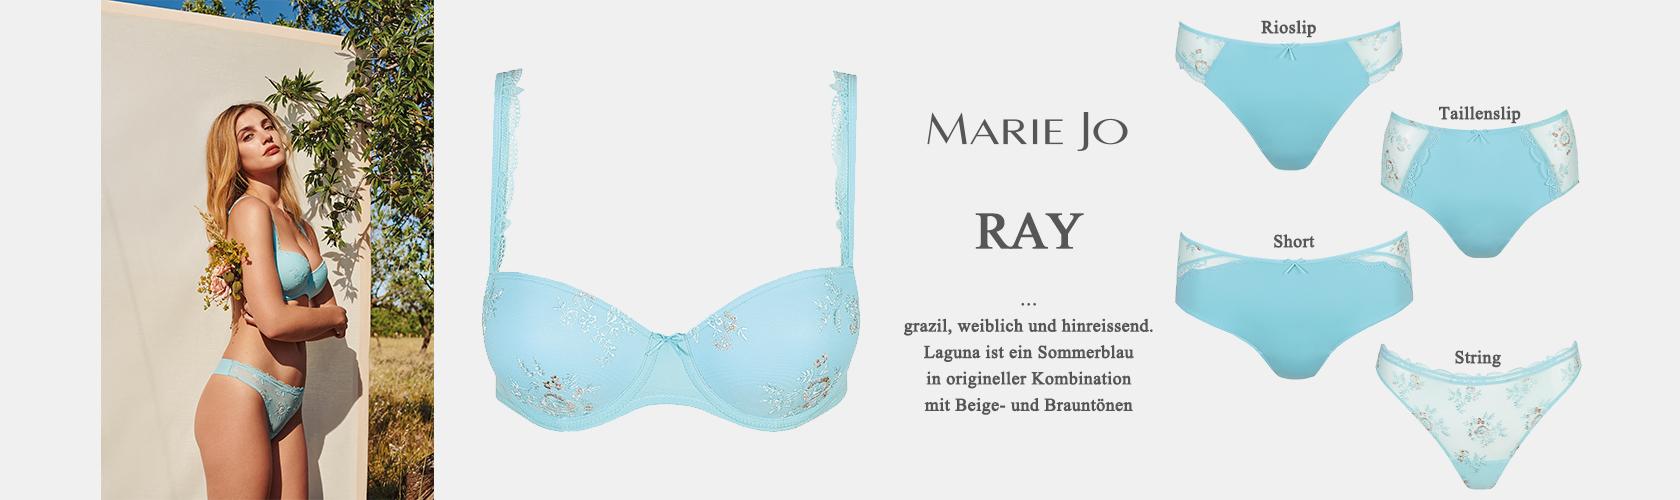 Slideshow RAY LAU + NAT 09.08.